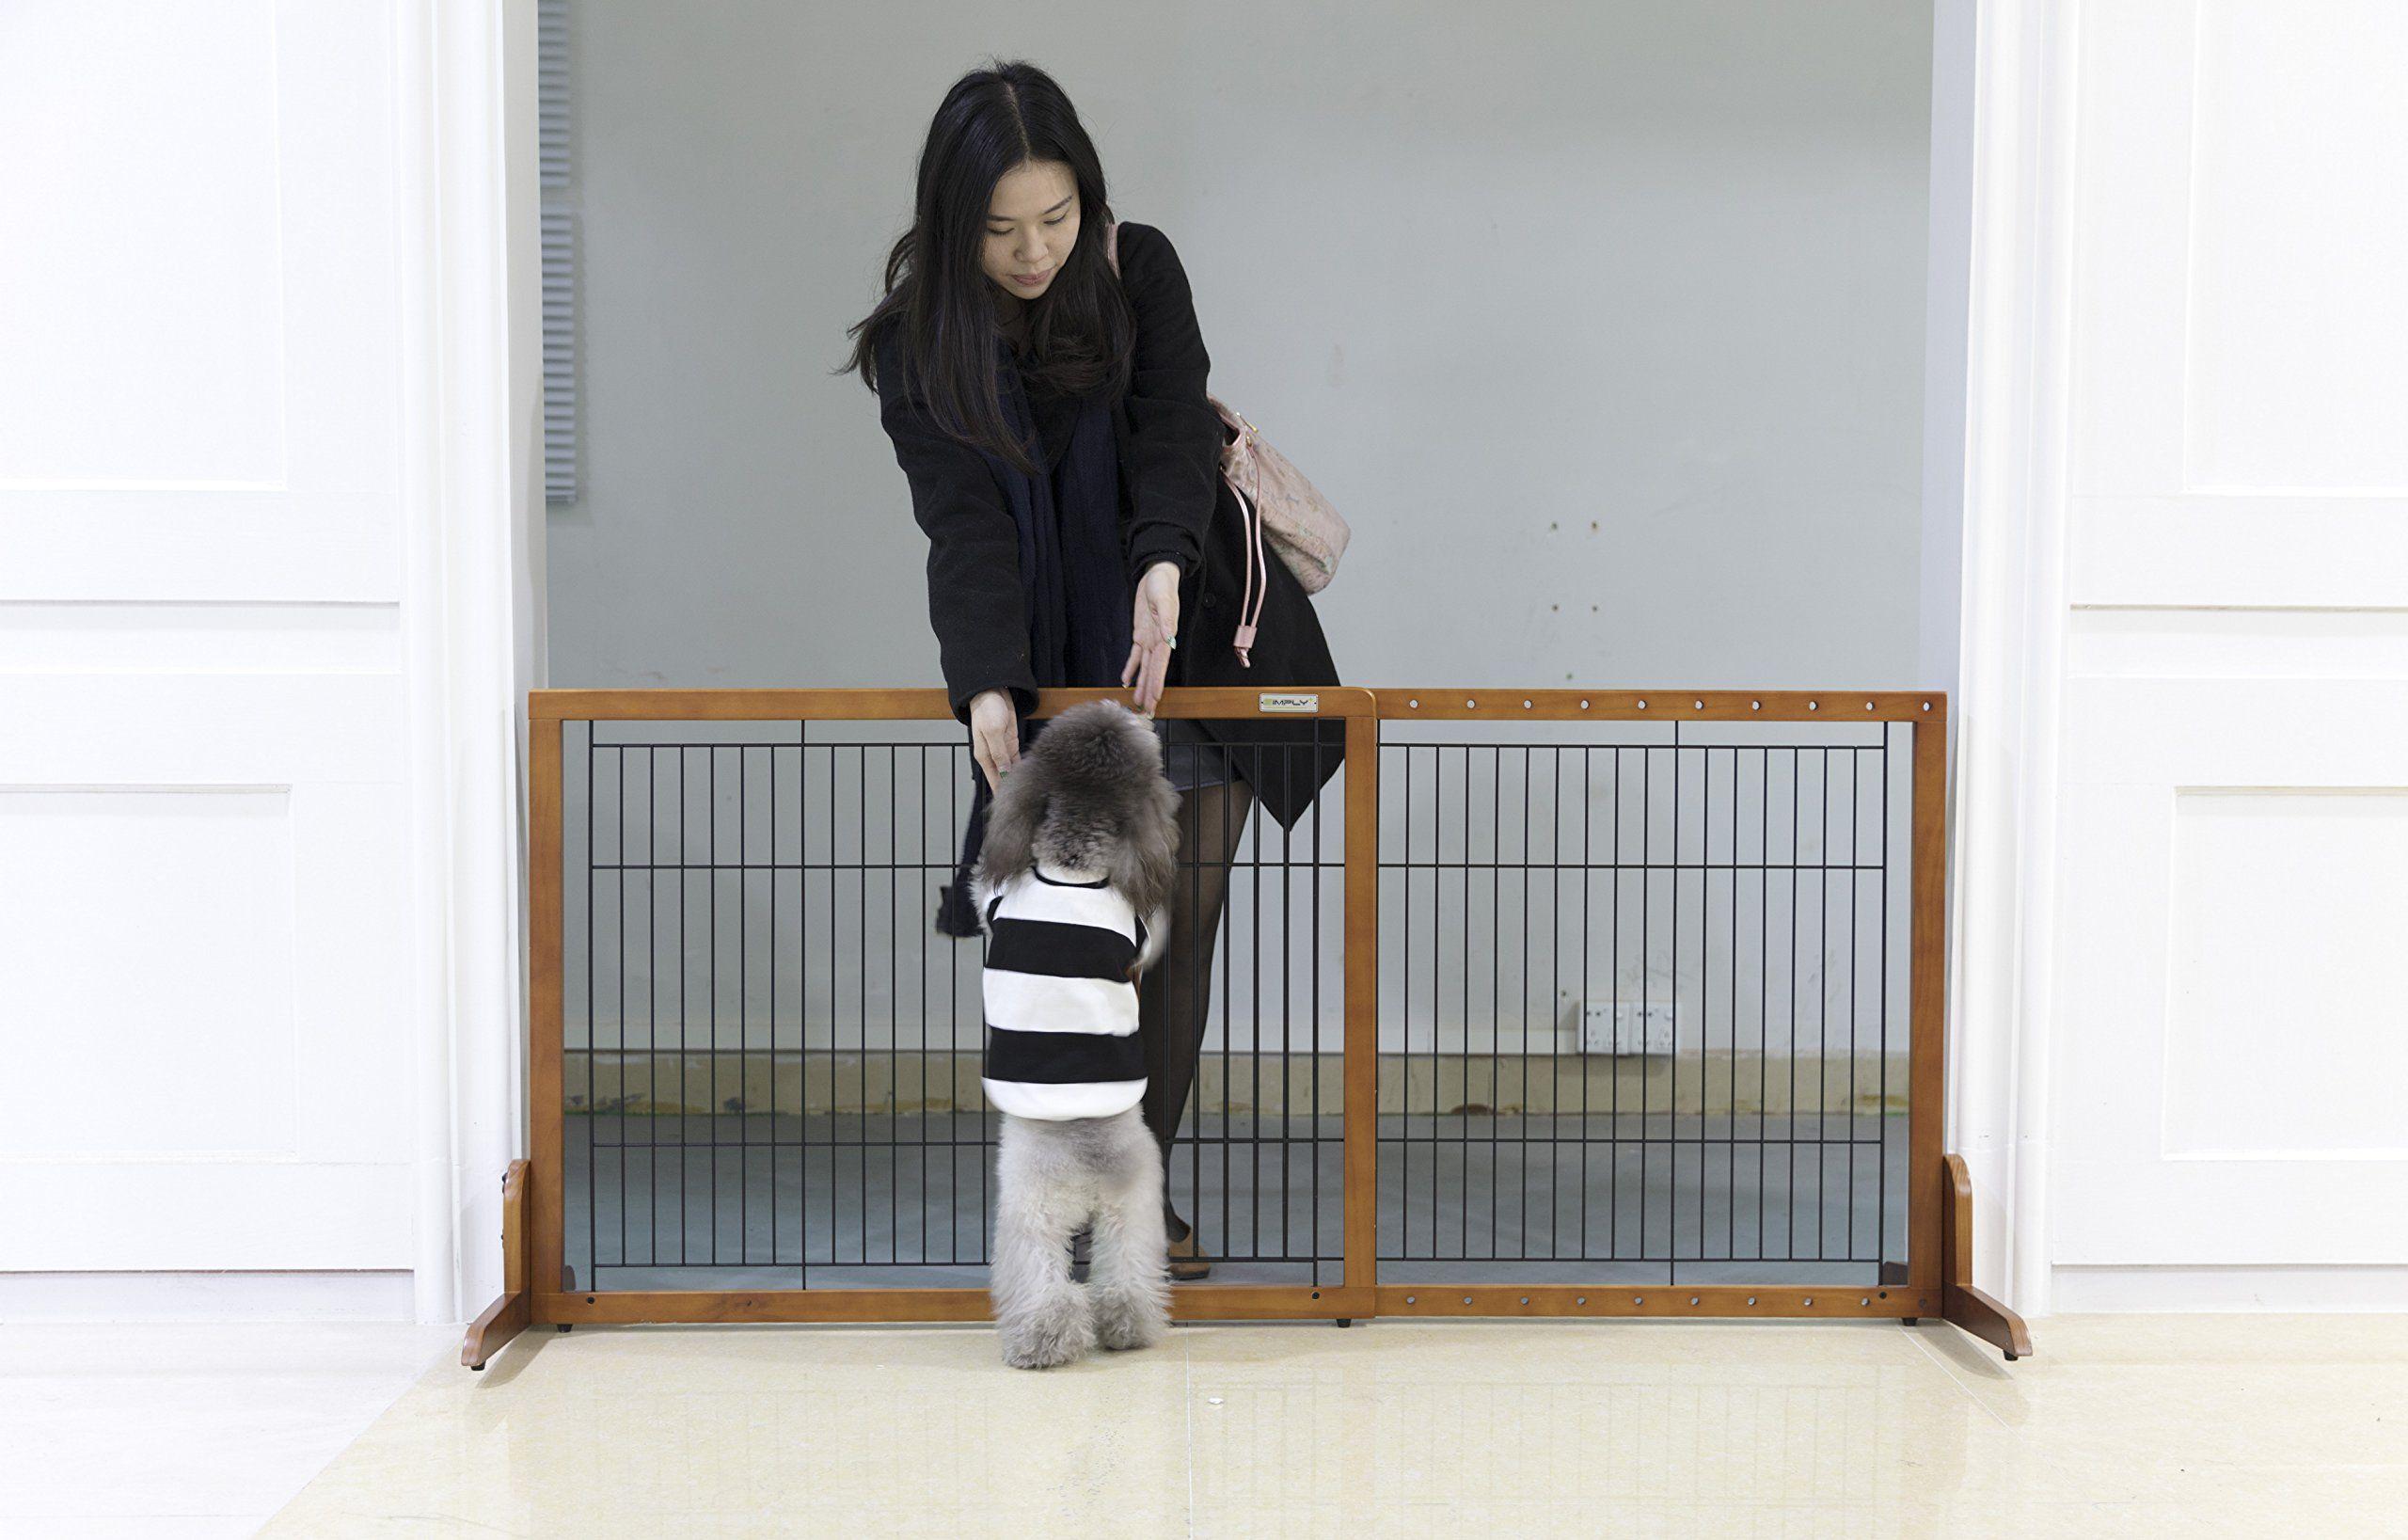 Simply Plus Wooden Pet Gate No Door Freestanding Pet Dog Gate For Indoor Home And Office Use Keeps Pets Safe Easy Set Up No Tools Dog Gate Pet Gate Pet Safe